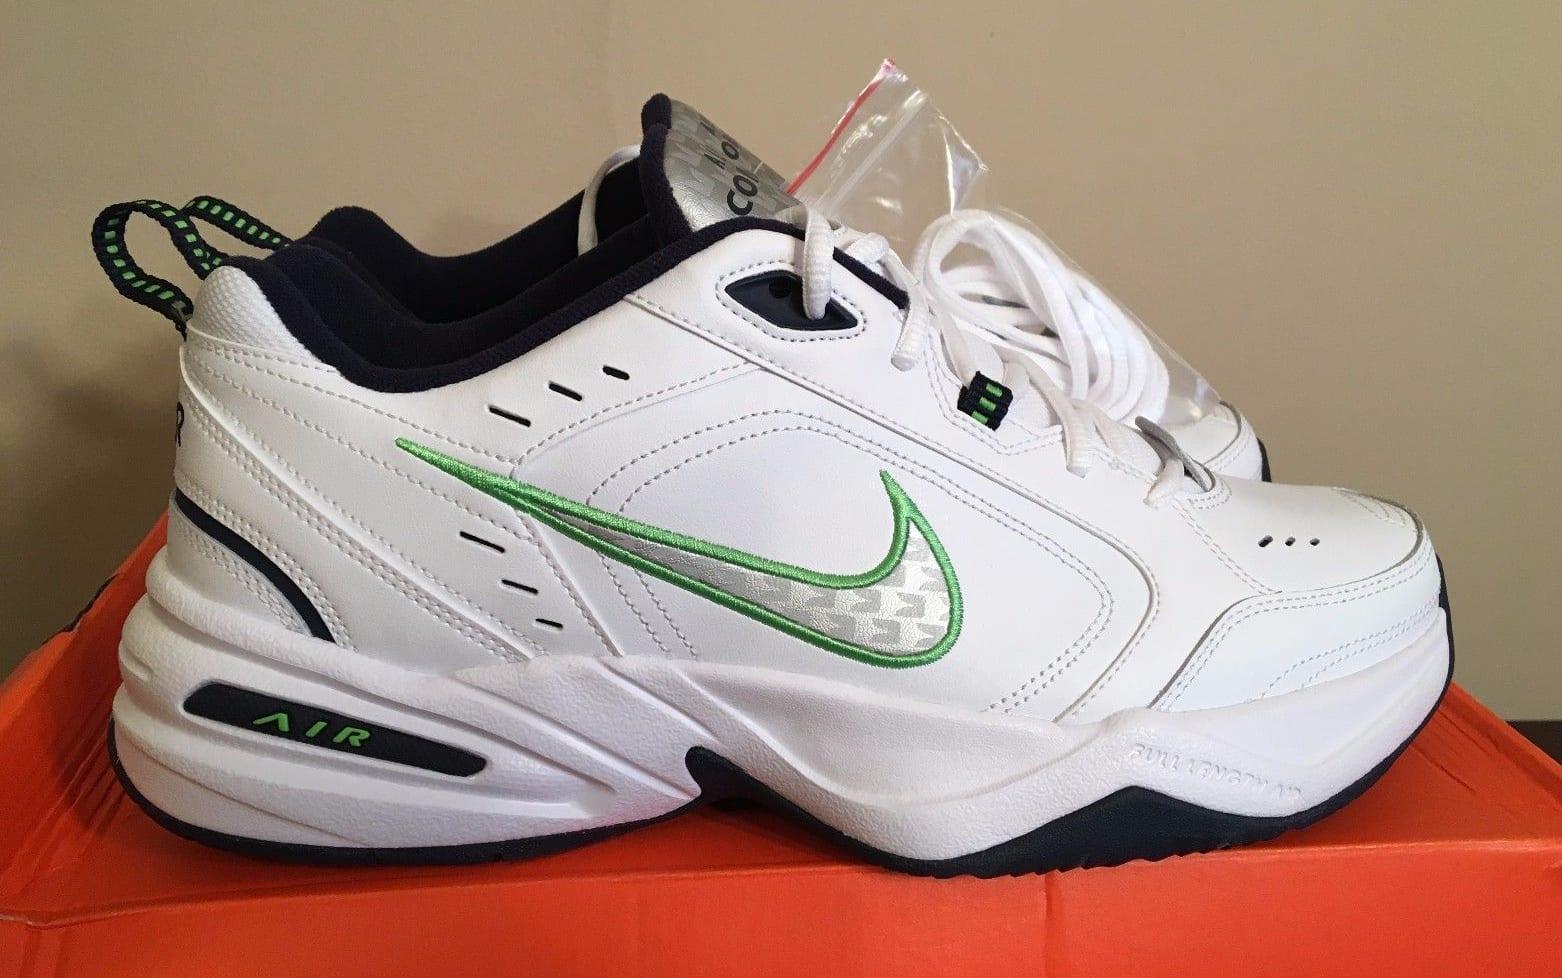 Air Jordan Monarch Shoes